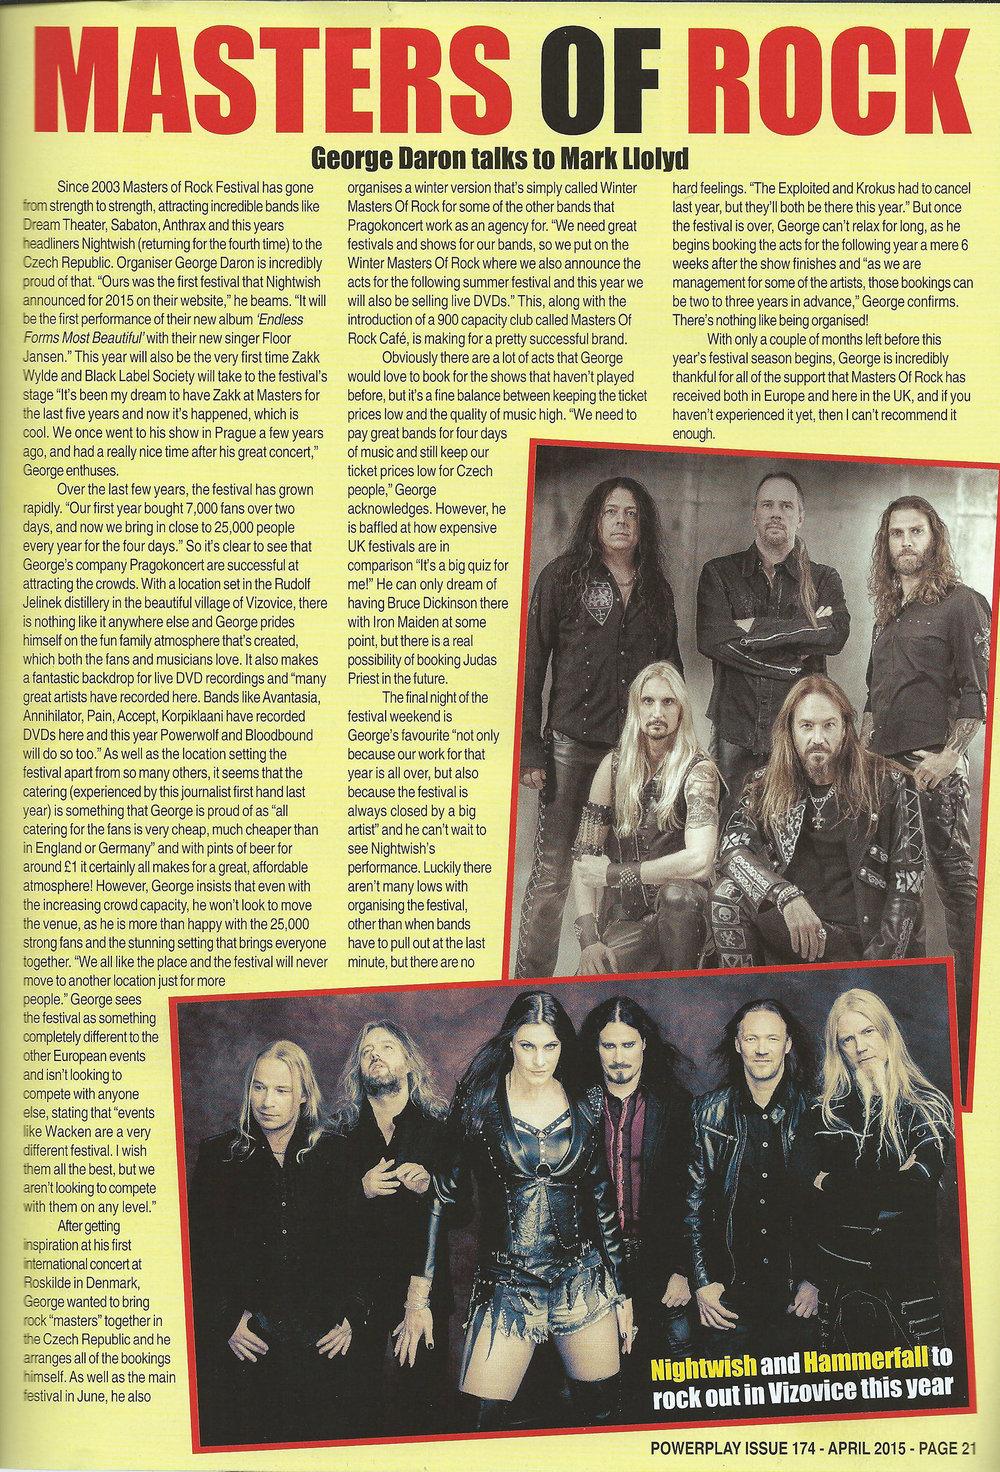 PowerPlay Magazine - Masters of Rock Interview